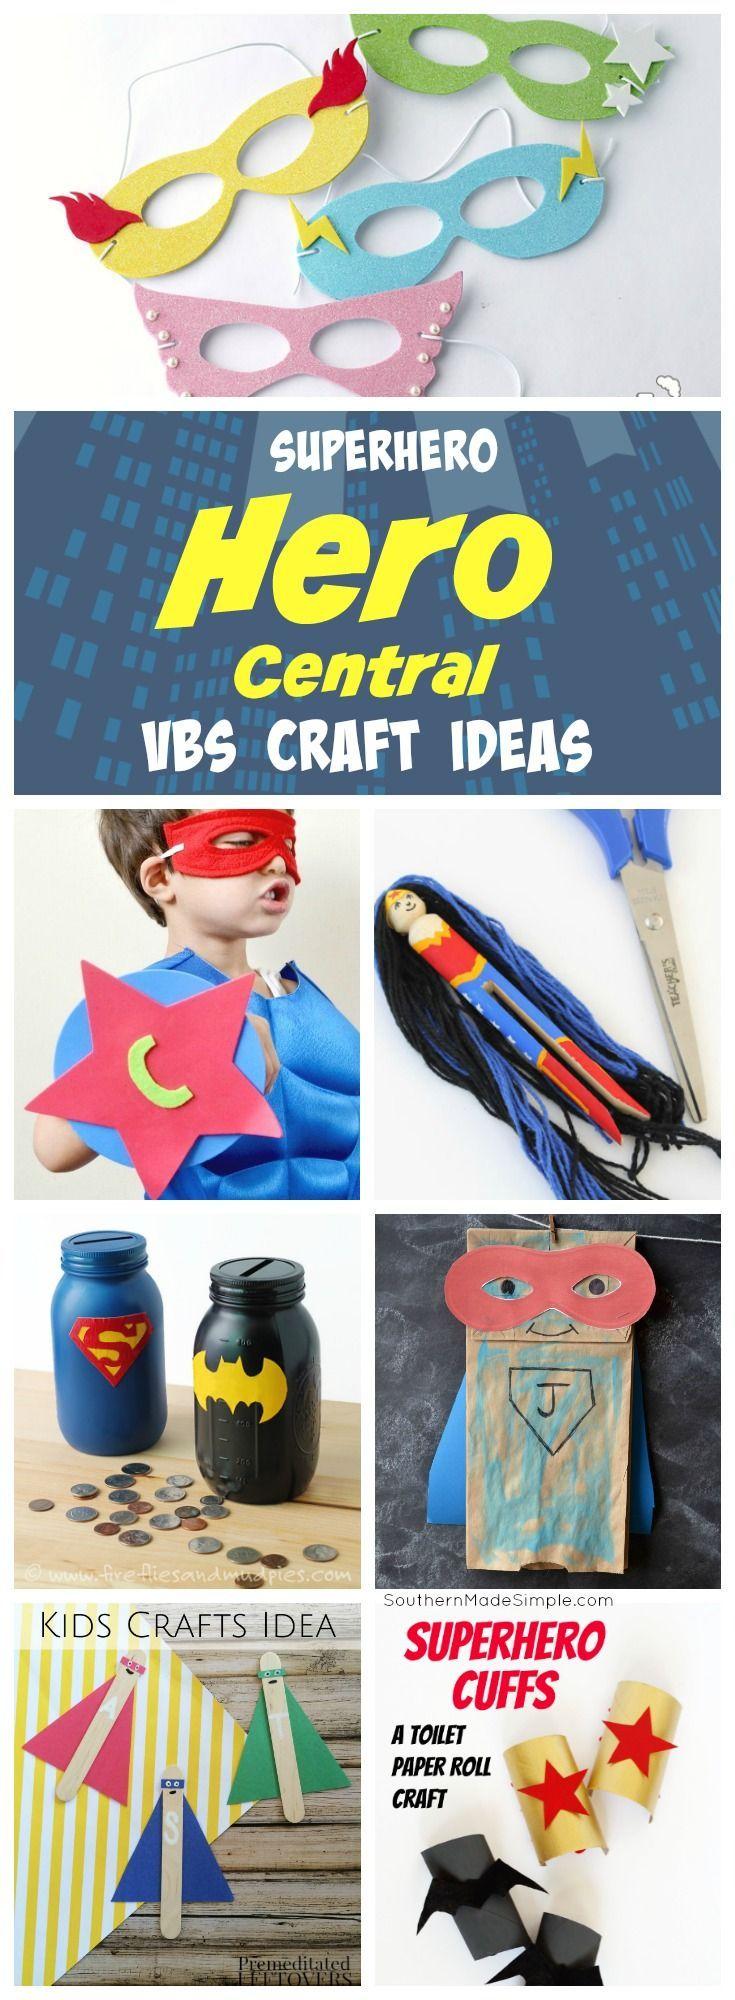 Superhero Craft Ideas - Hero Central VBS Theme - Southern Made Simple #superhero